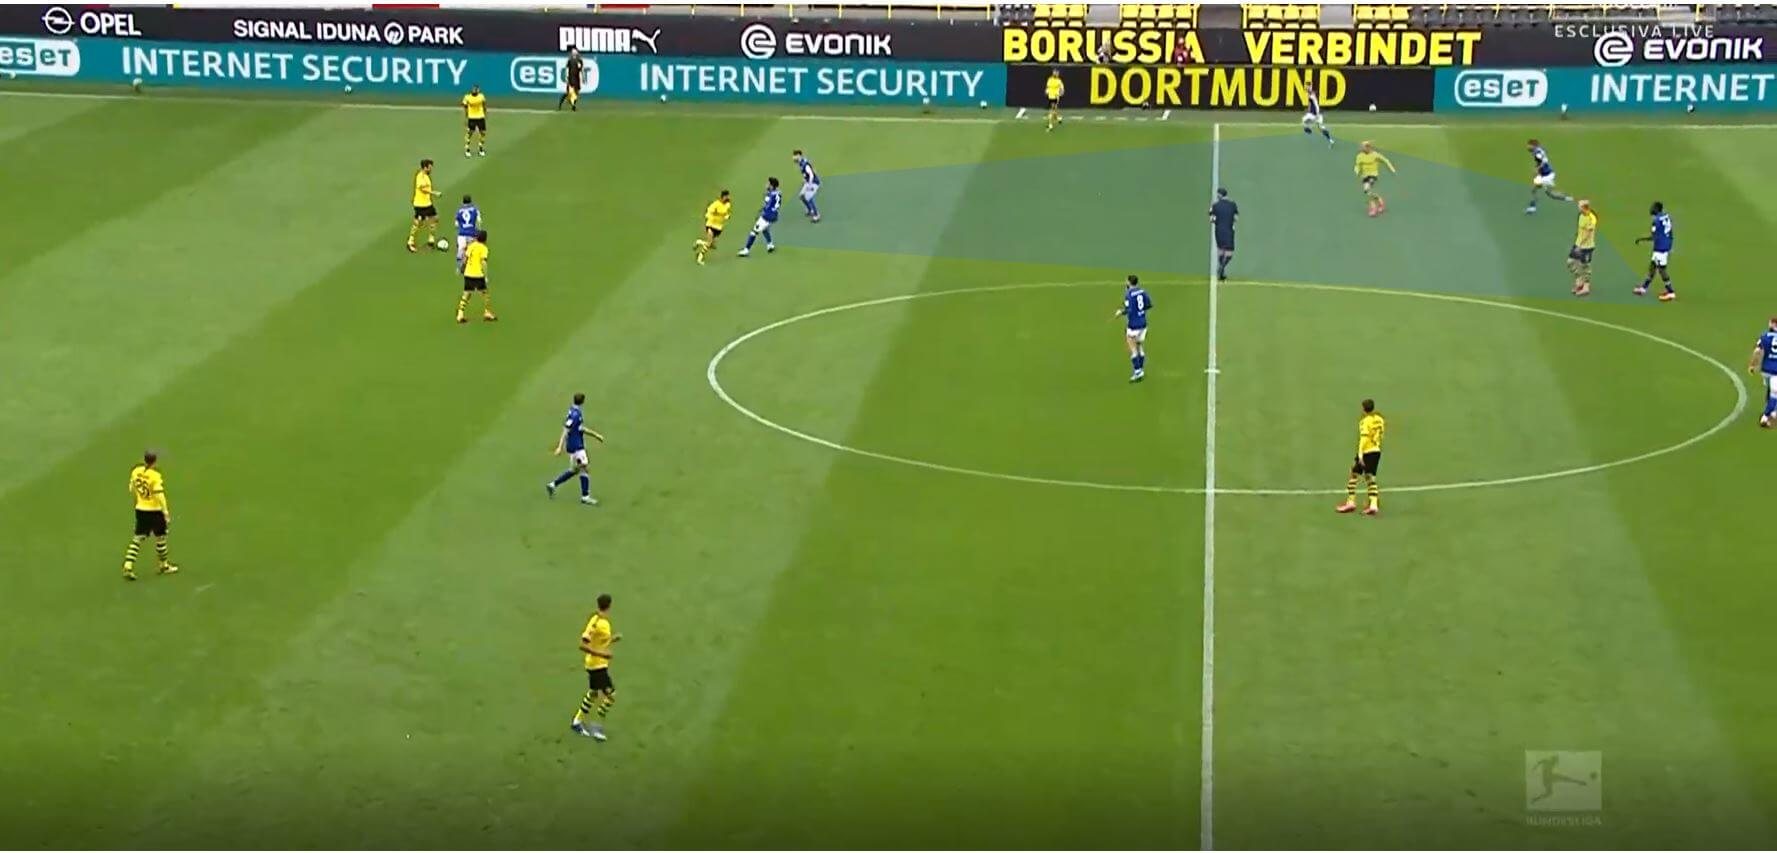 Bundesliga 2019/20: Borussia Dortmund vs Schalke- tactical analysis tactics